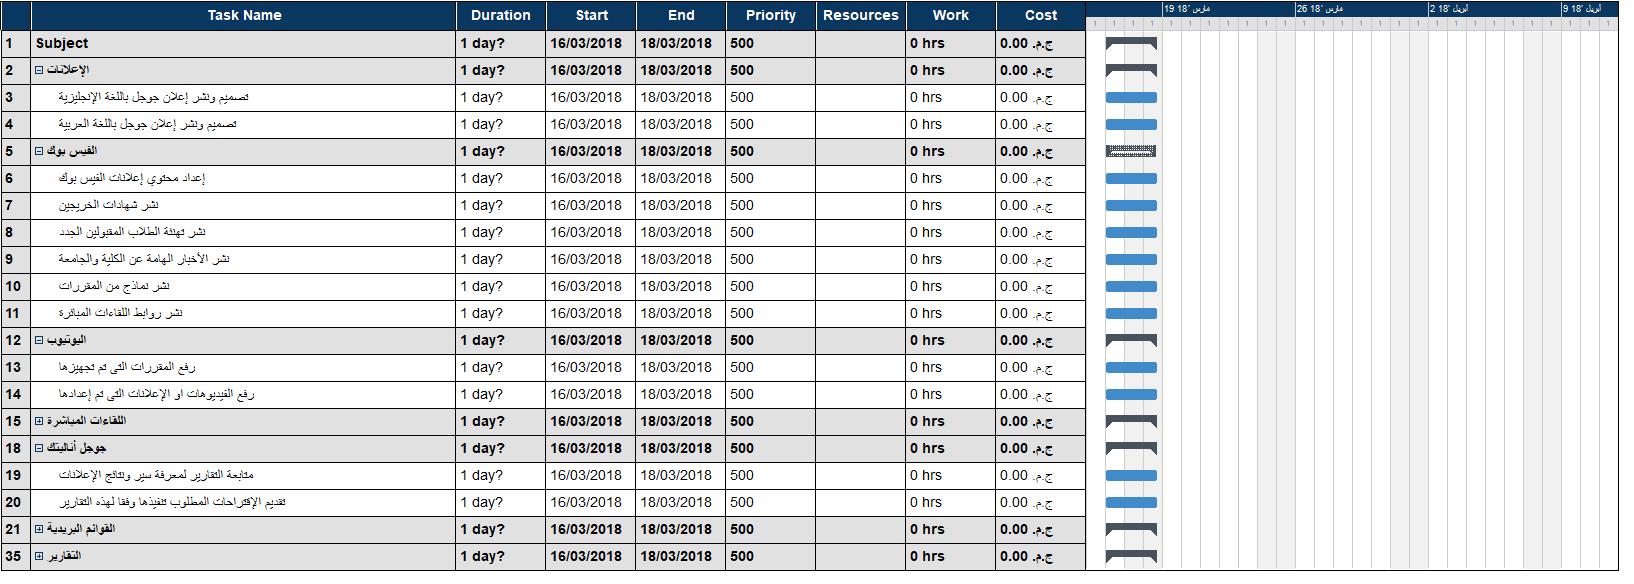 mvwebdav1 Gantt Chart